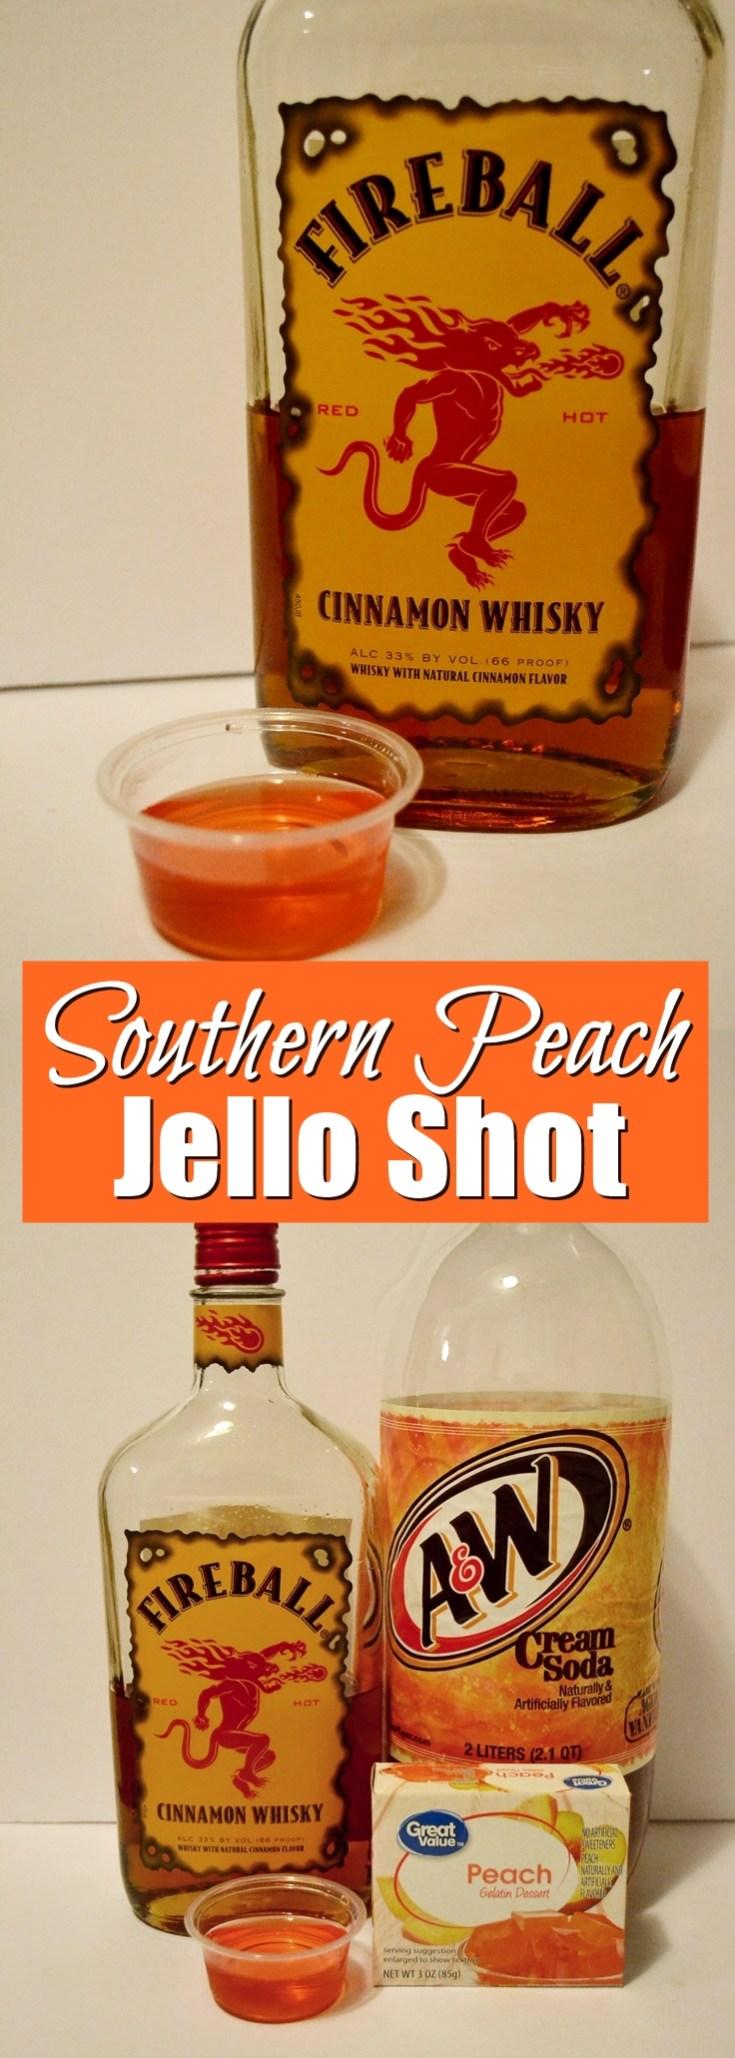 Southern Peach Jello Shots | Unicorn Hideout